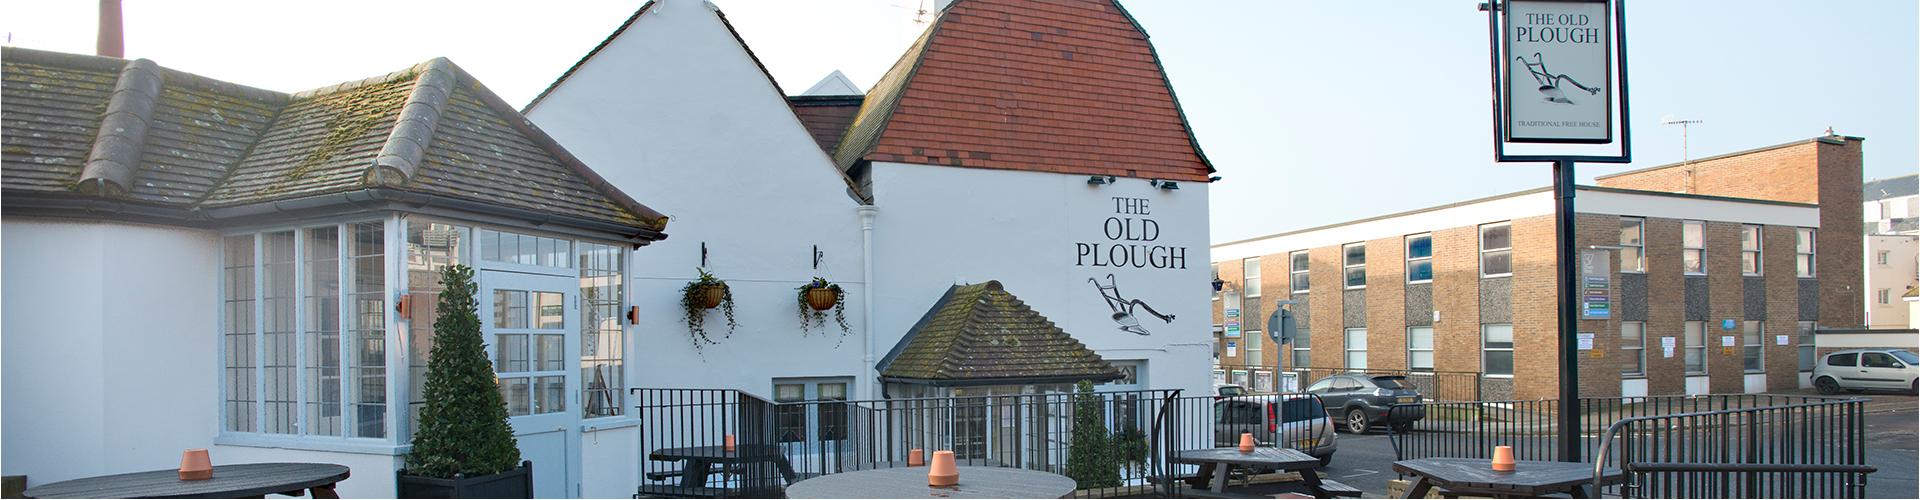 2018 - Classics - Old Plough